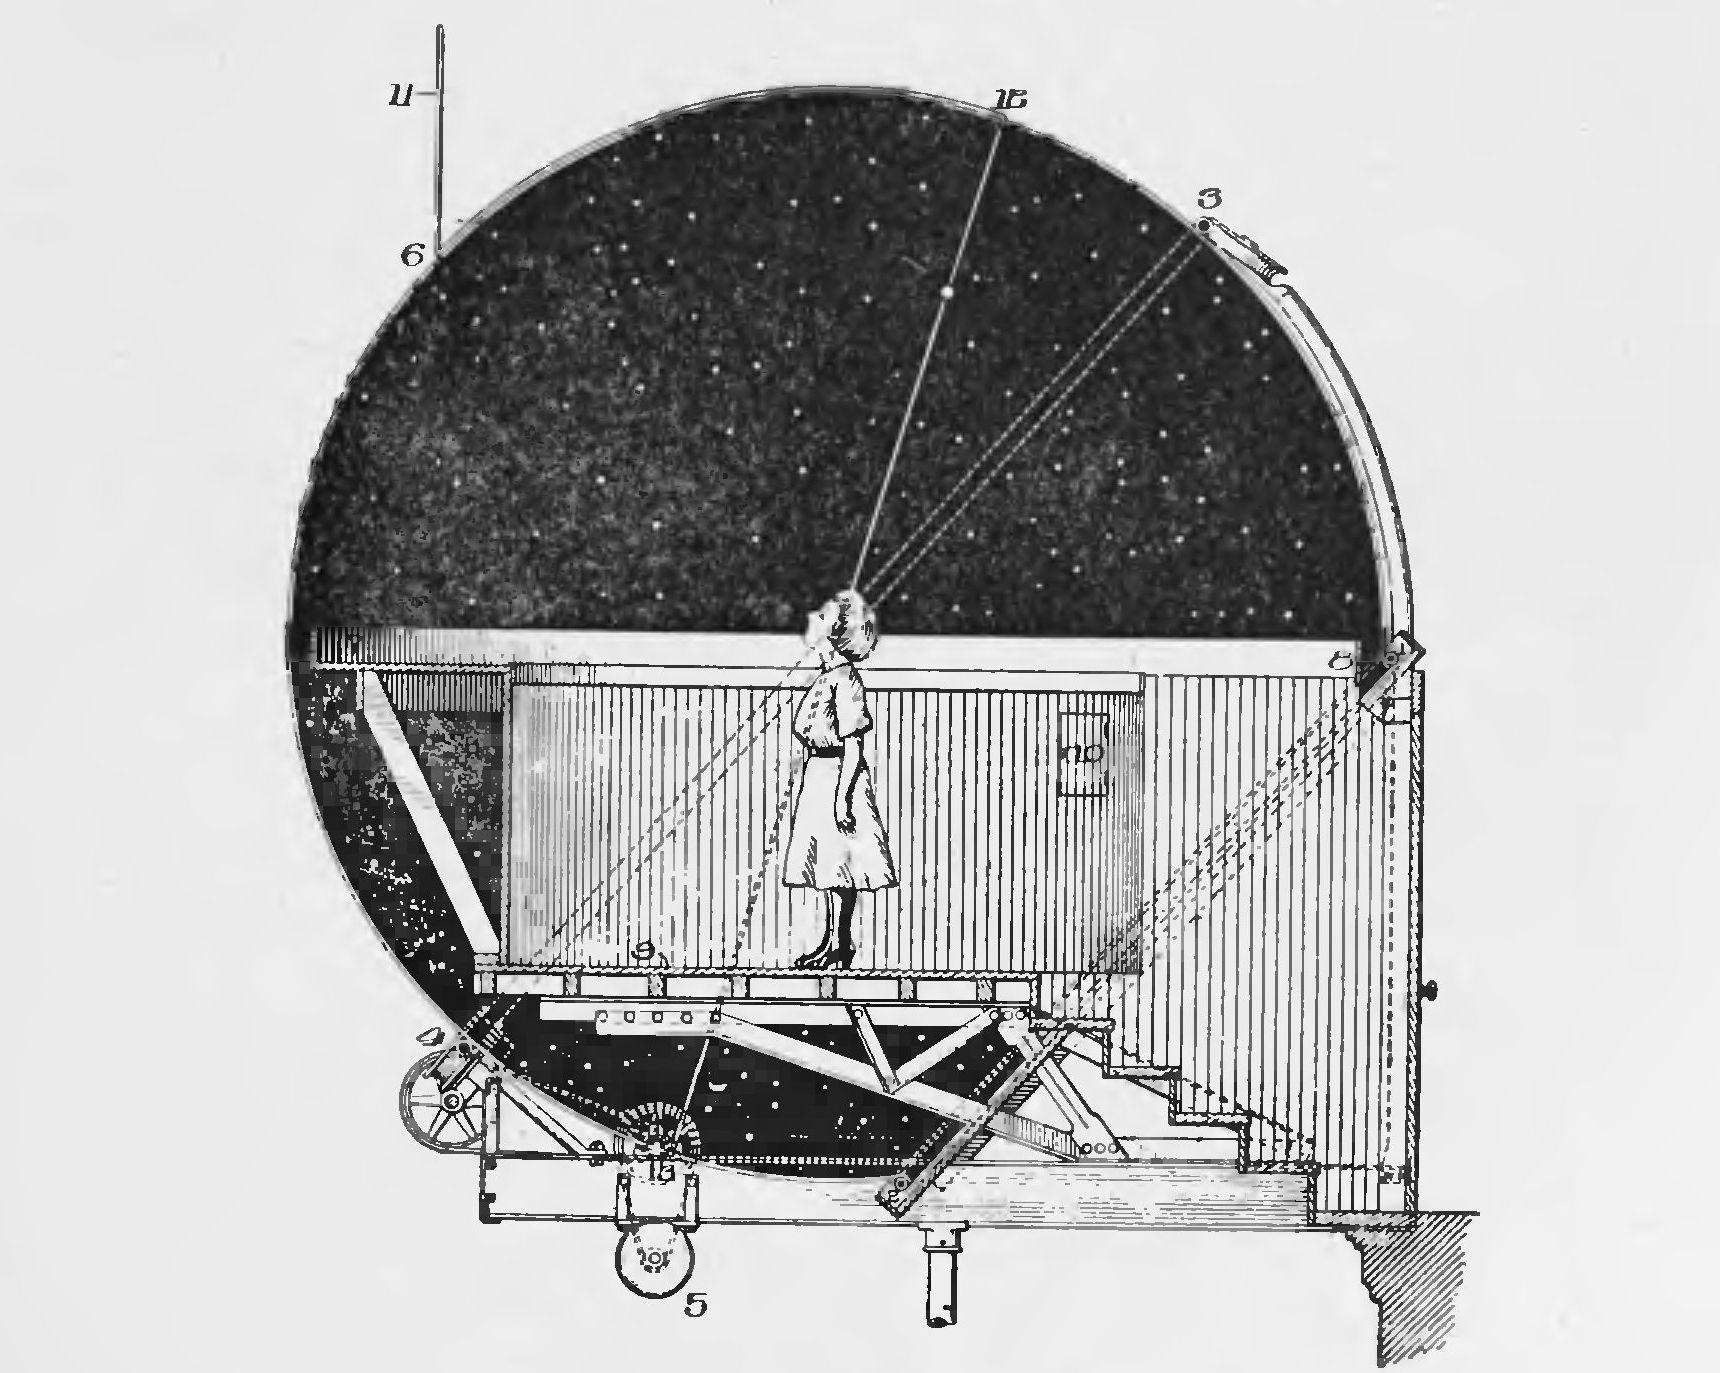 Atwoodova sféra, zdroj: wikipedia